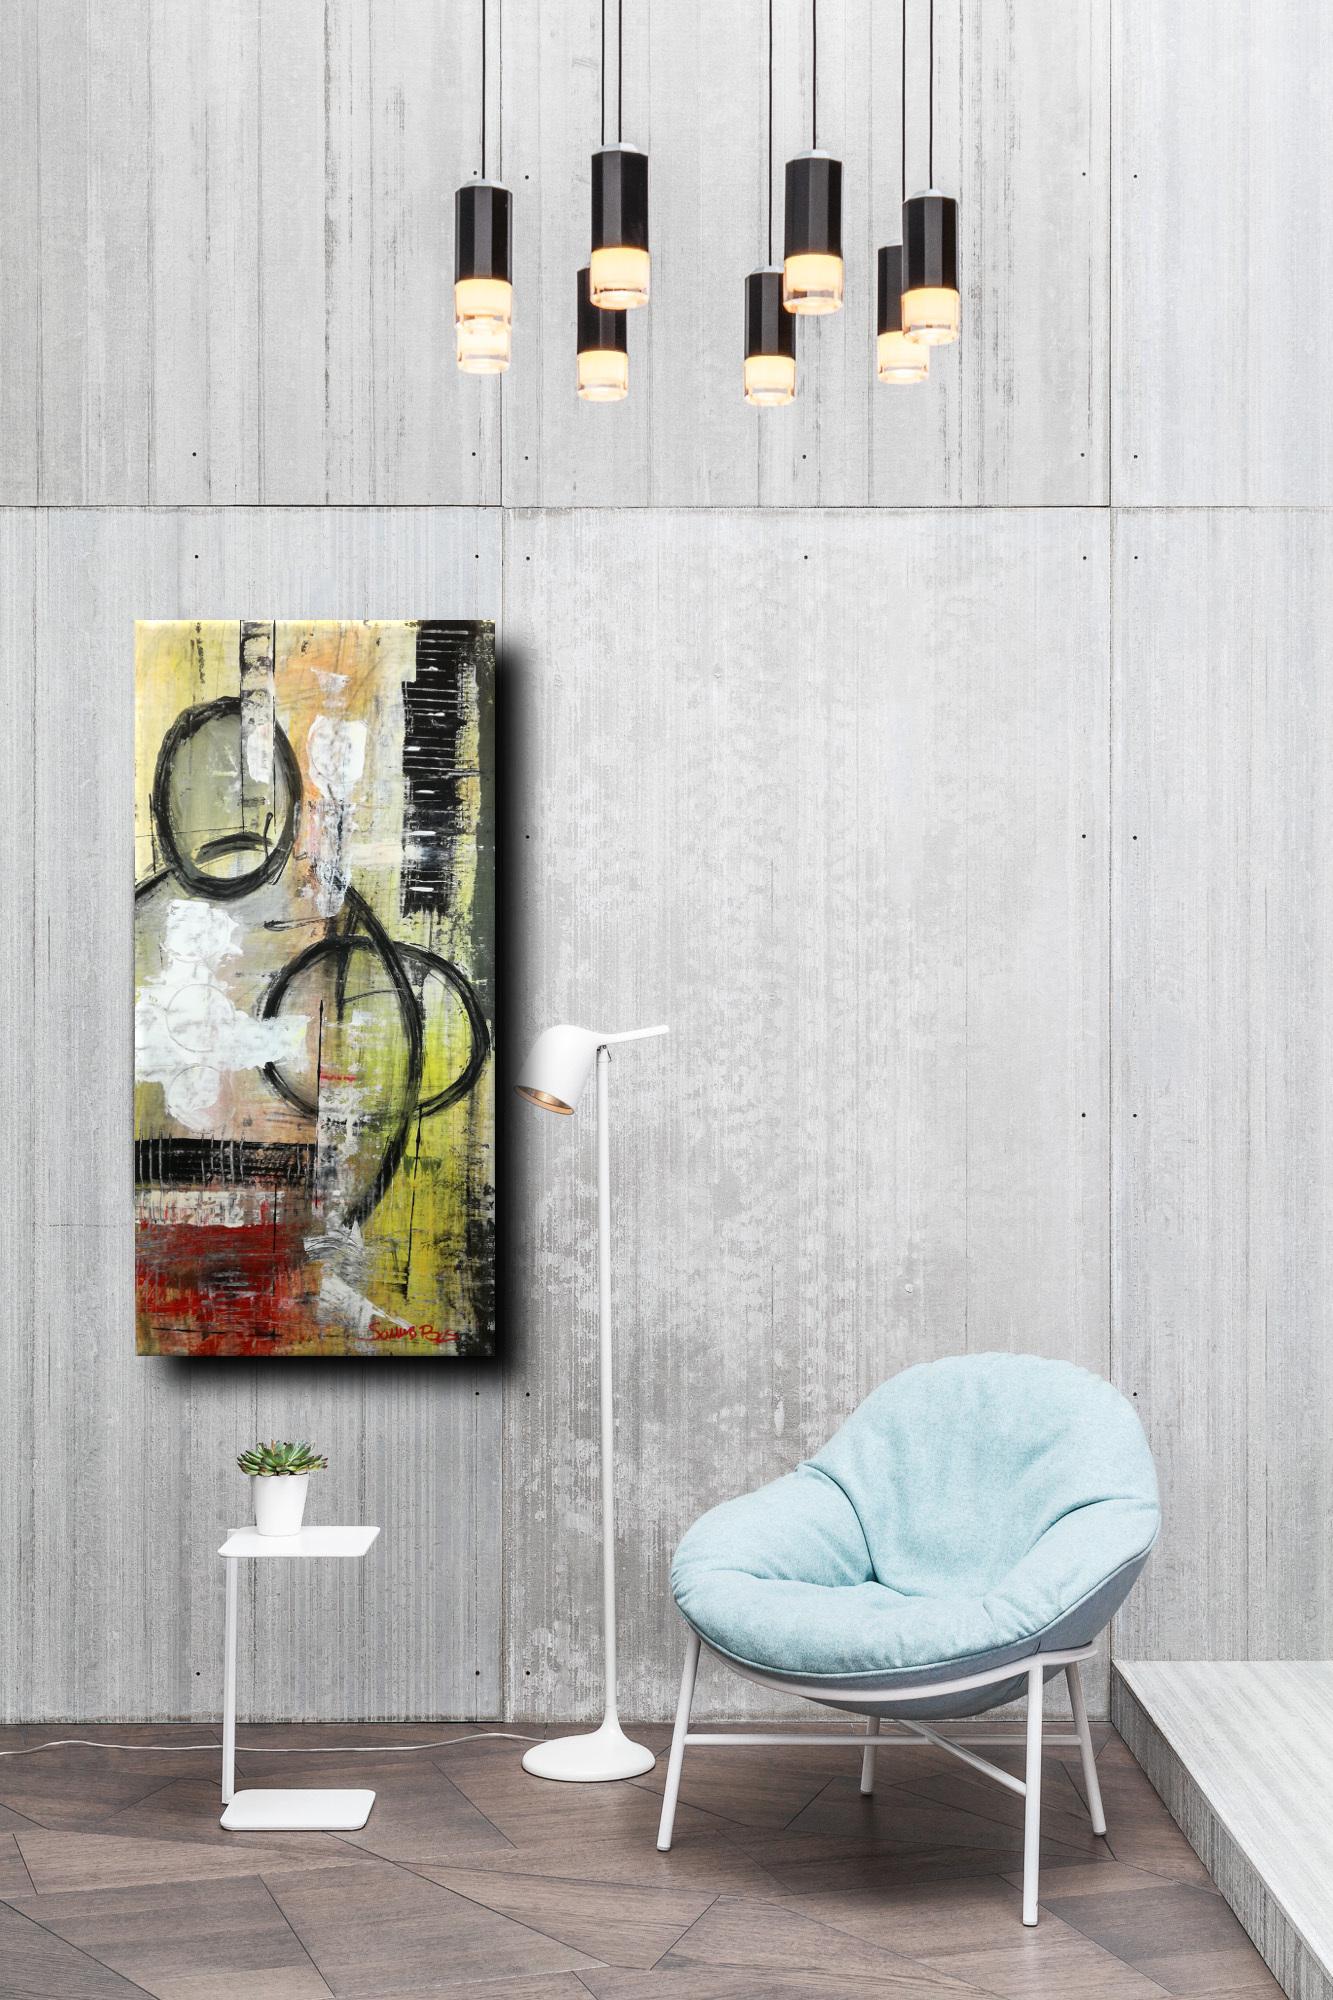 astr c028 - dipinti moderni  fatti a mano 70x35olio su tela